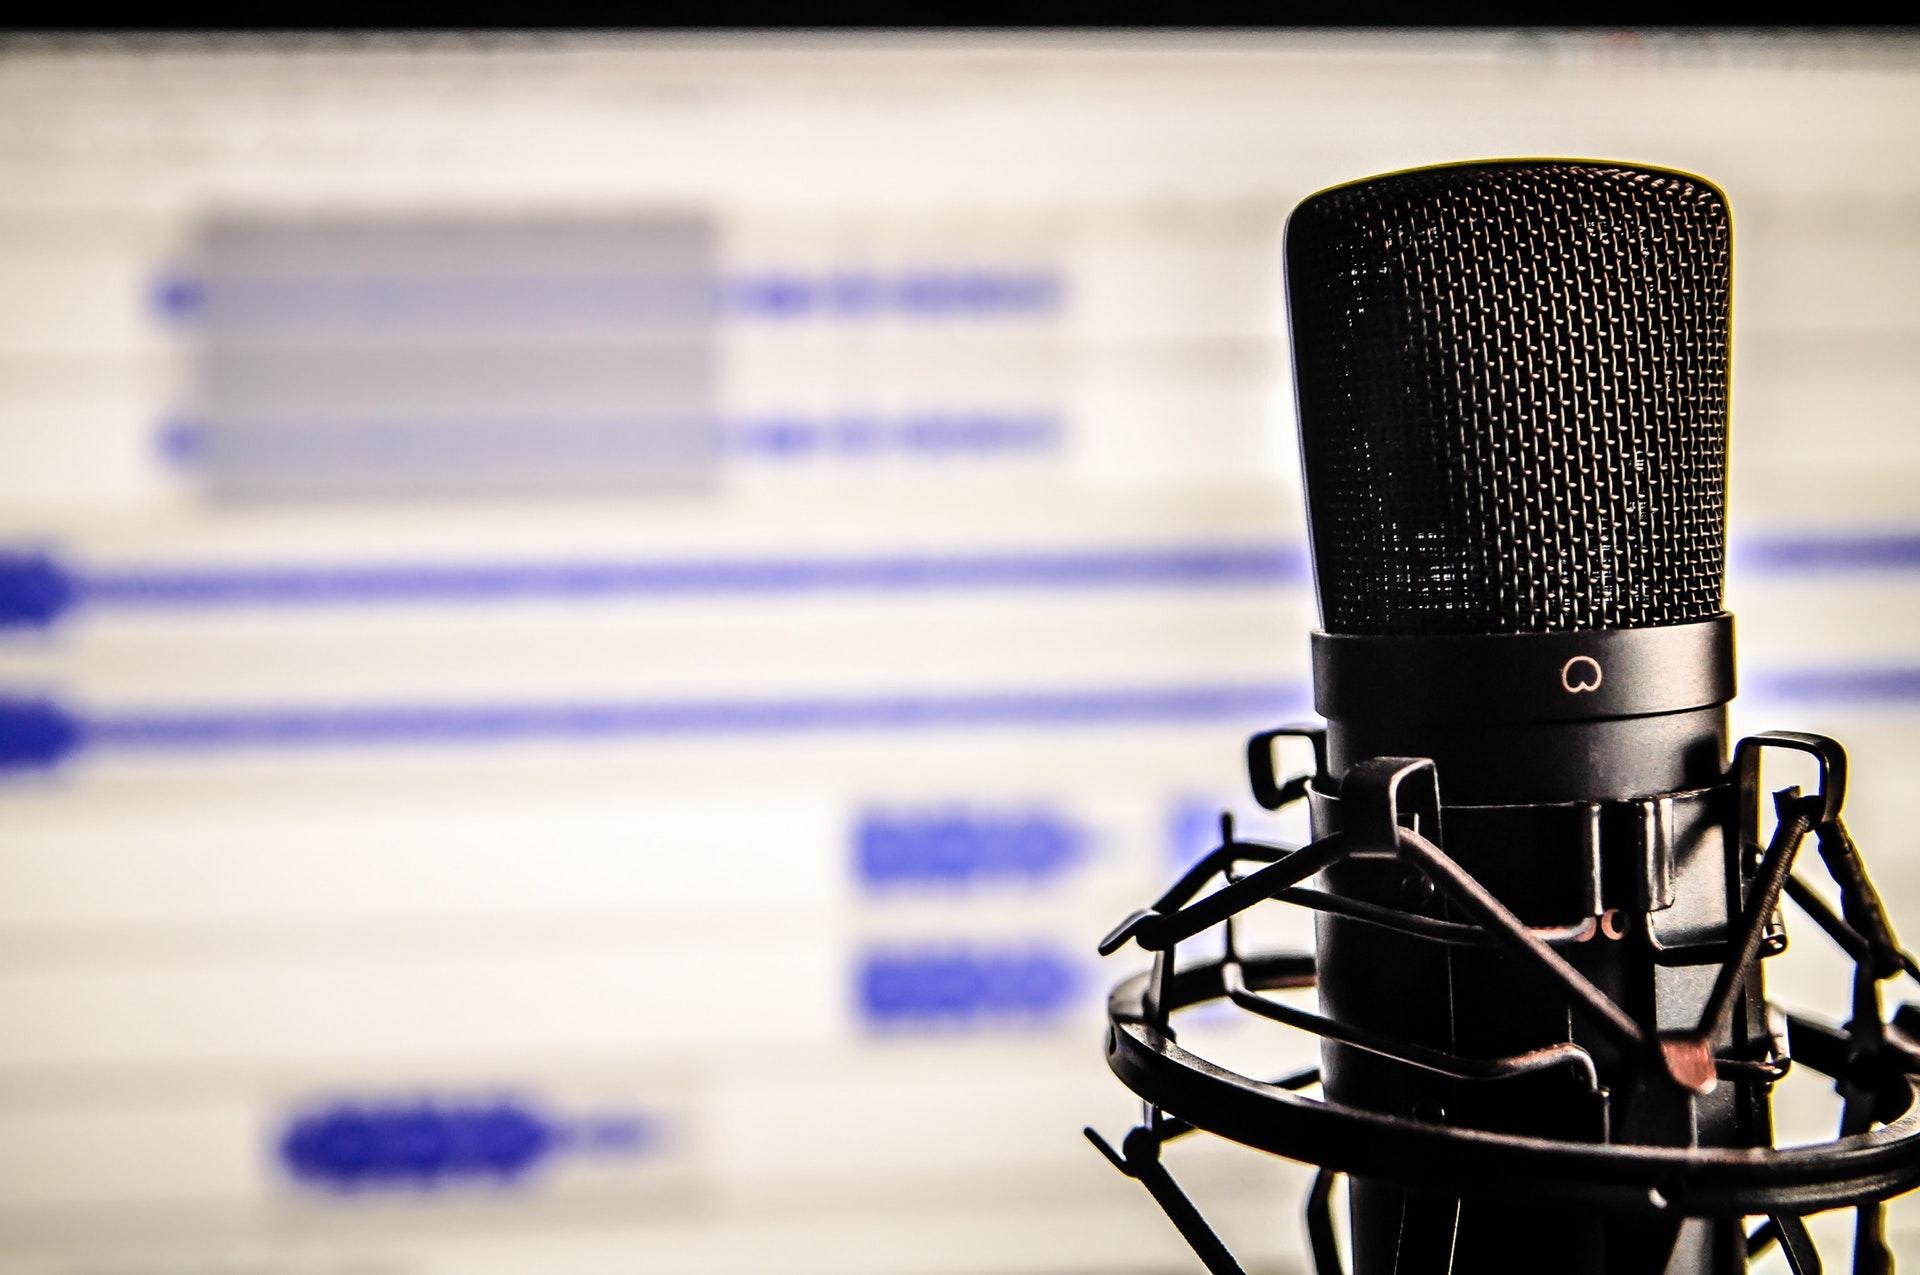 microphone-audio-computer-sound-recording-55800